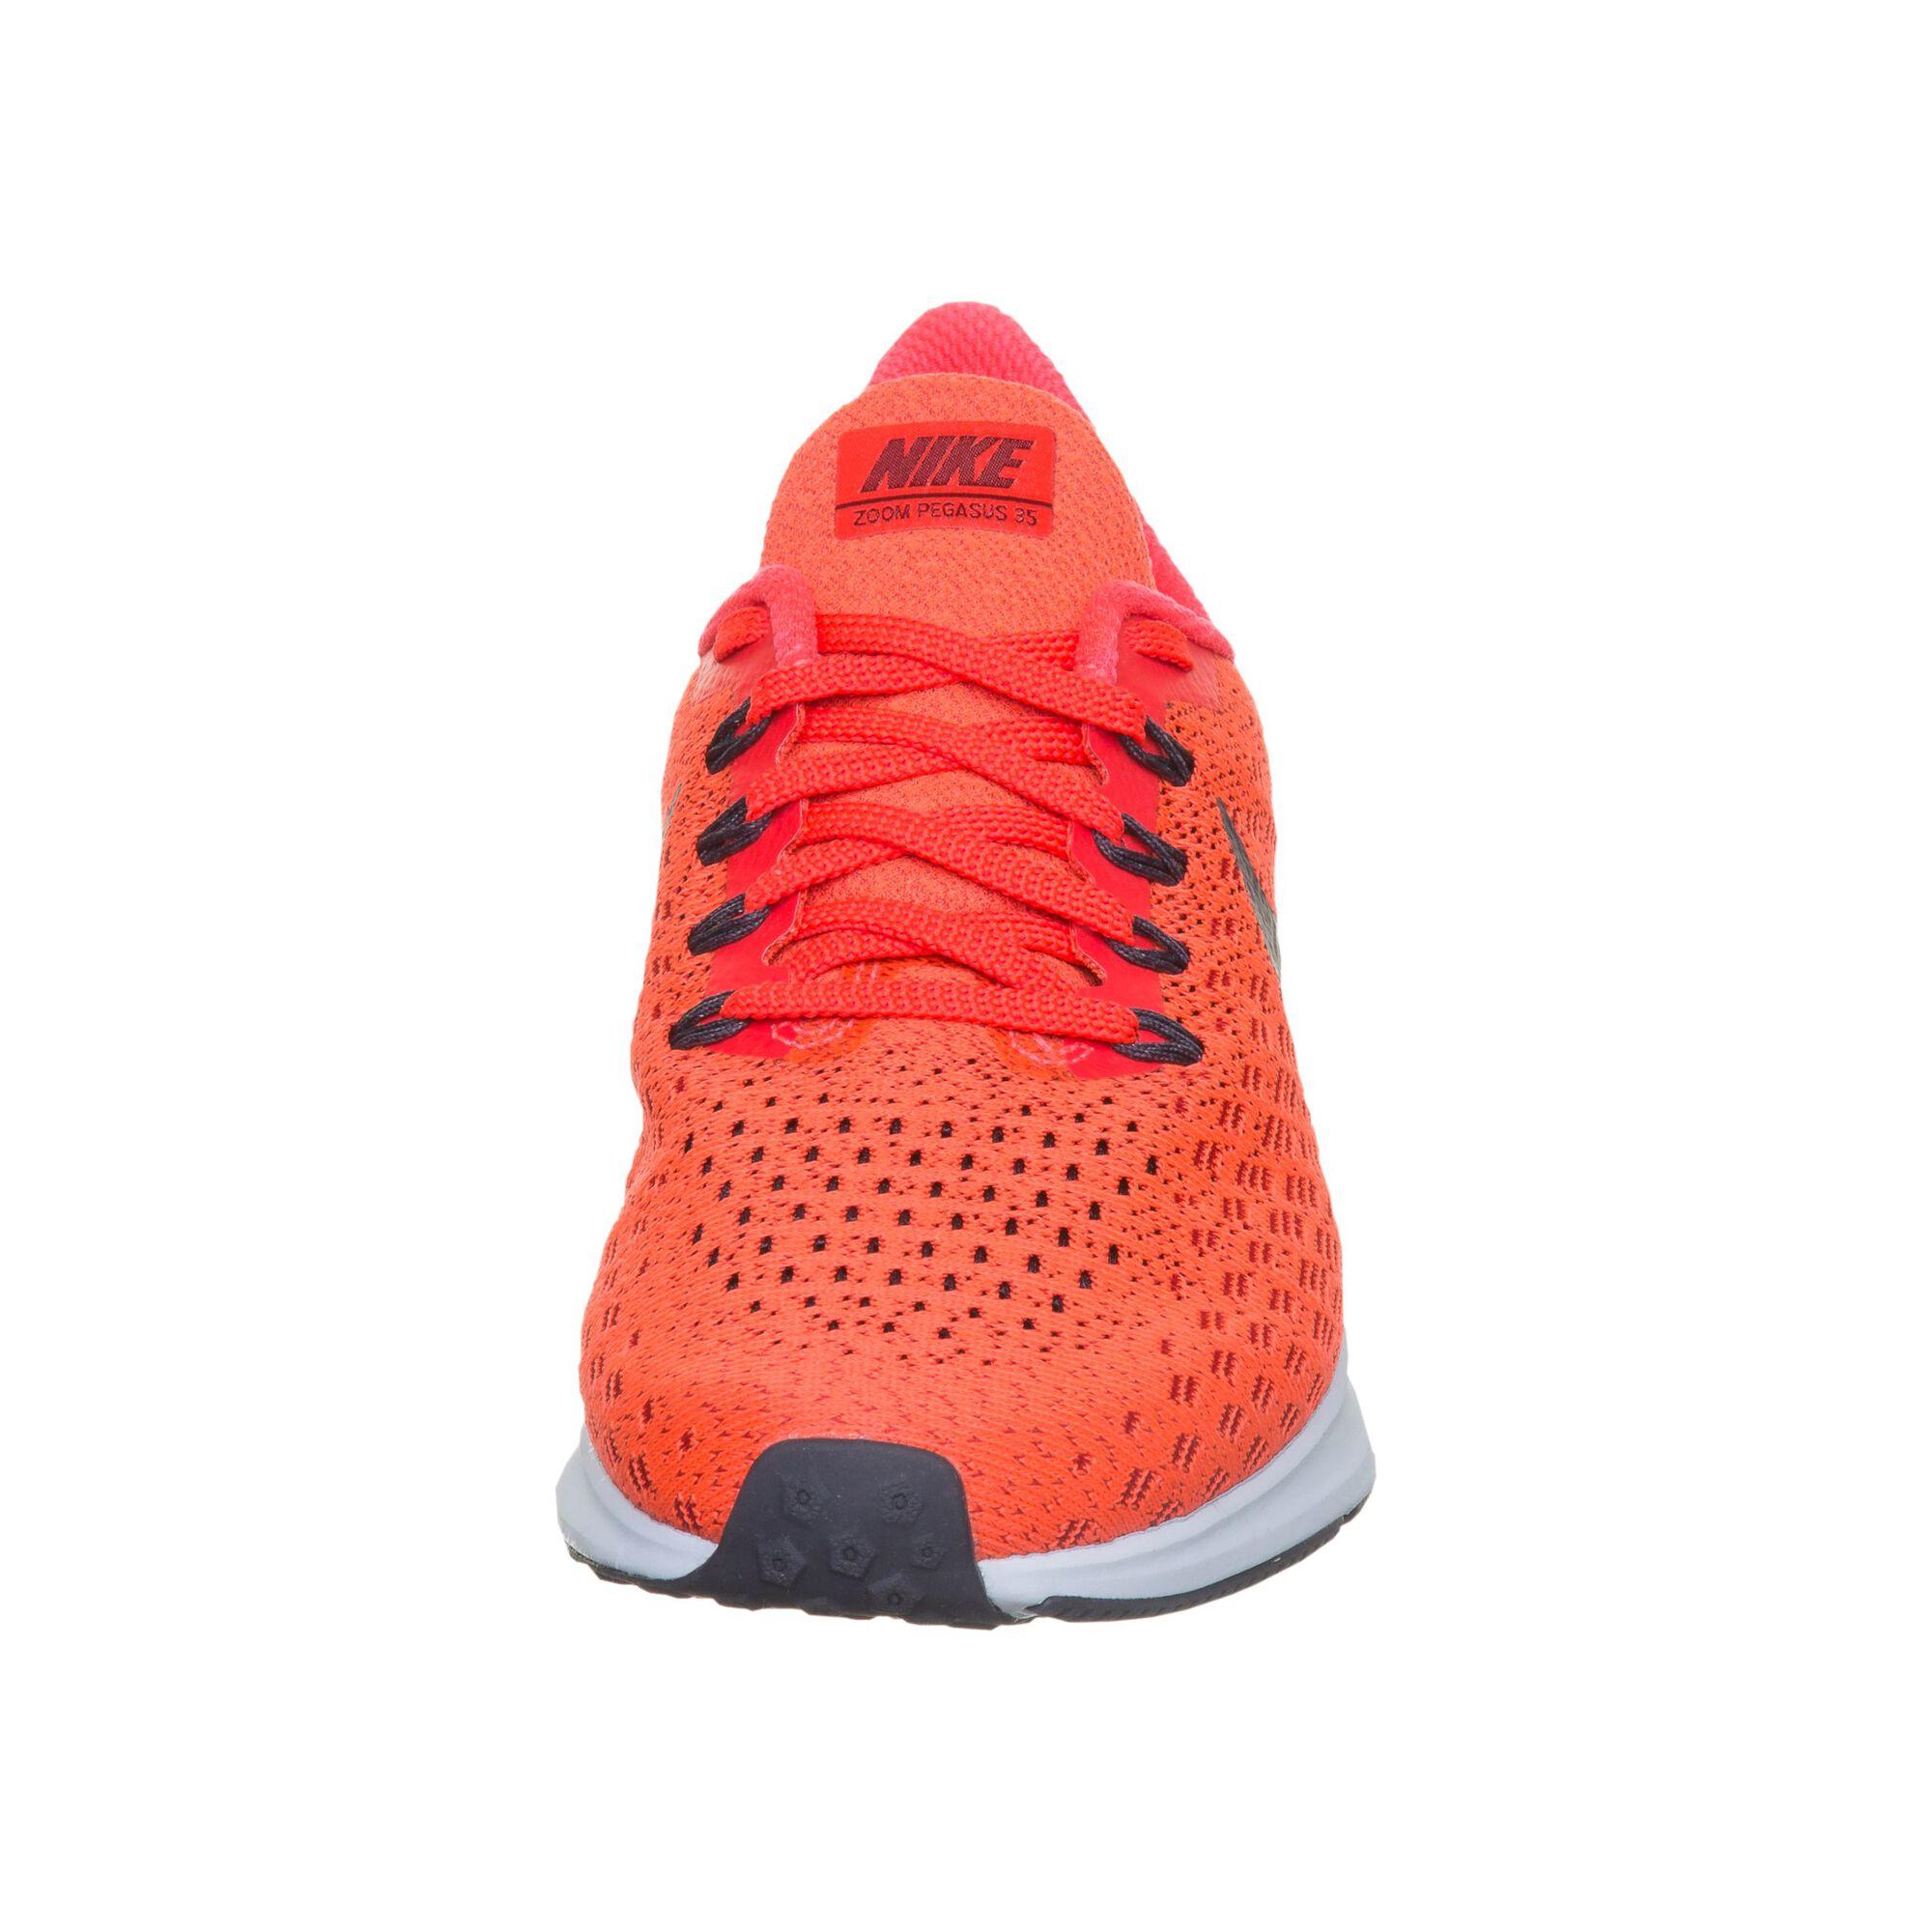 652d4706f1b6 buy Nike Air Zoom Pegasus 35 Neutral Running Shoe Women - Orange ...